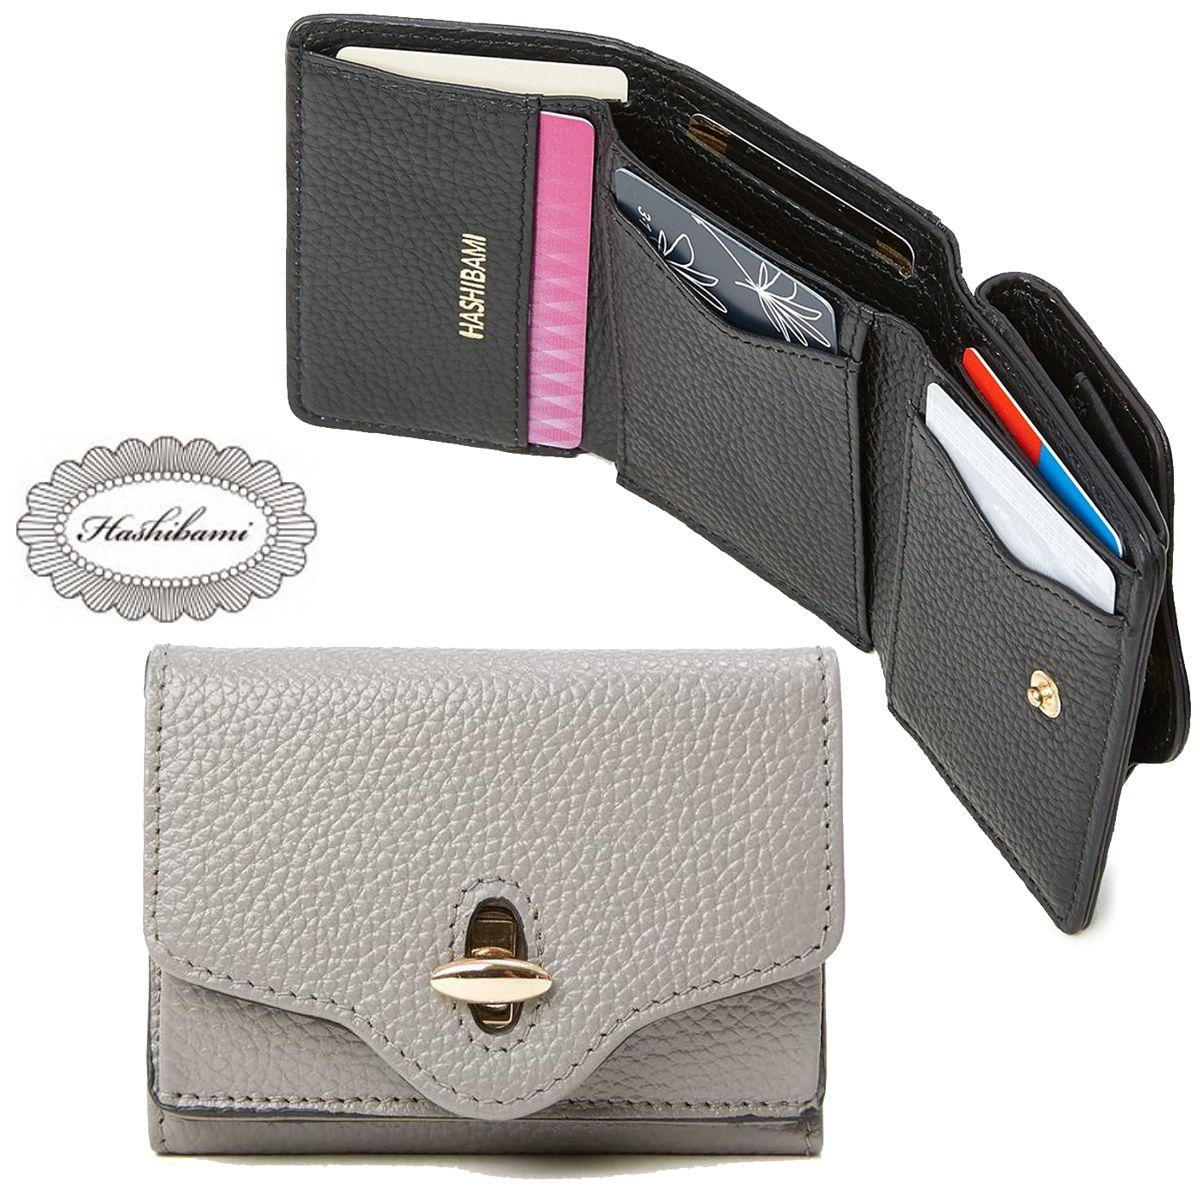 Hashibami(ハシバミ) Hashibami New Jean Mini Wallet [ニュー ジーン ミニウォレット] 財布 レディース 小銭入れ カード 本革 レザー ギフト プレゼント おしゃれ かわいい【送料無料】 【0824カード分割】